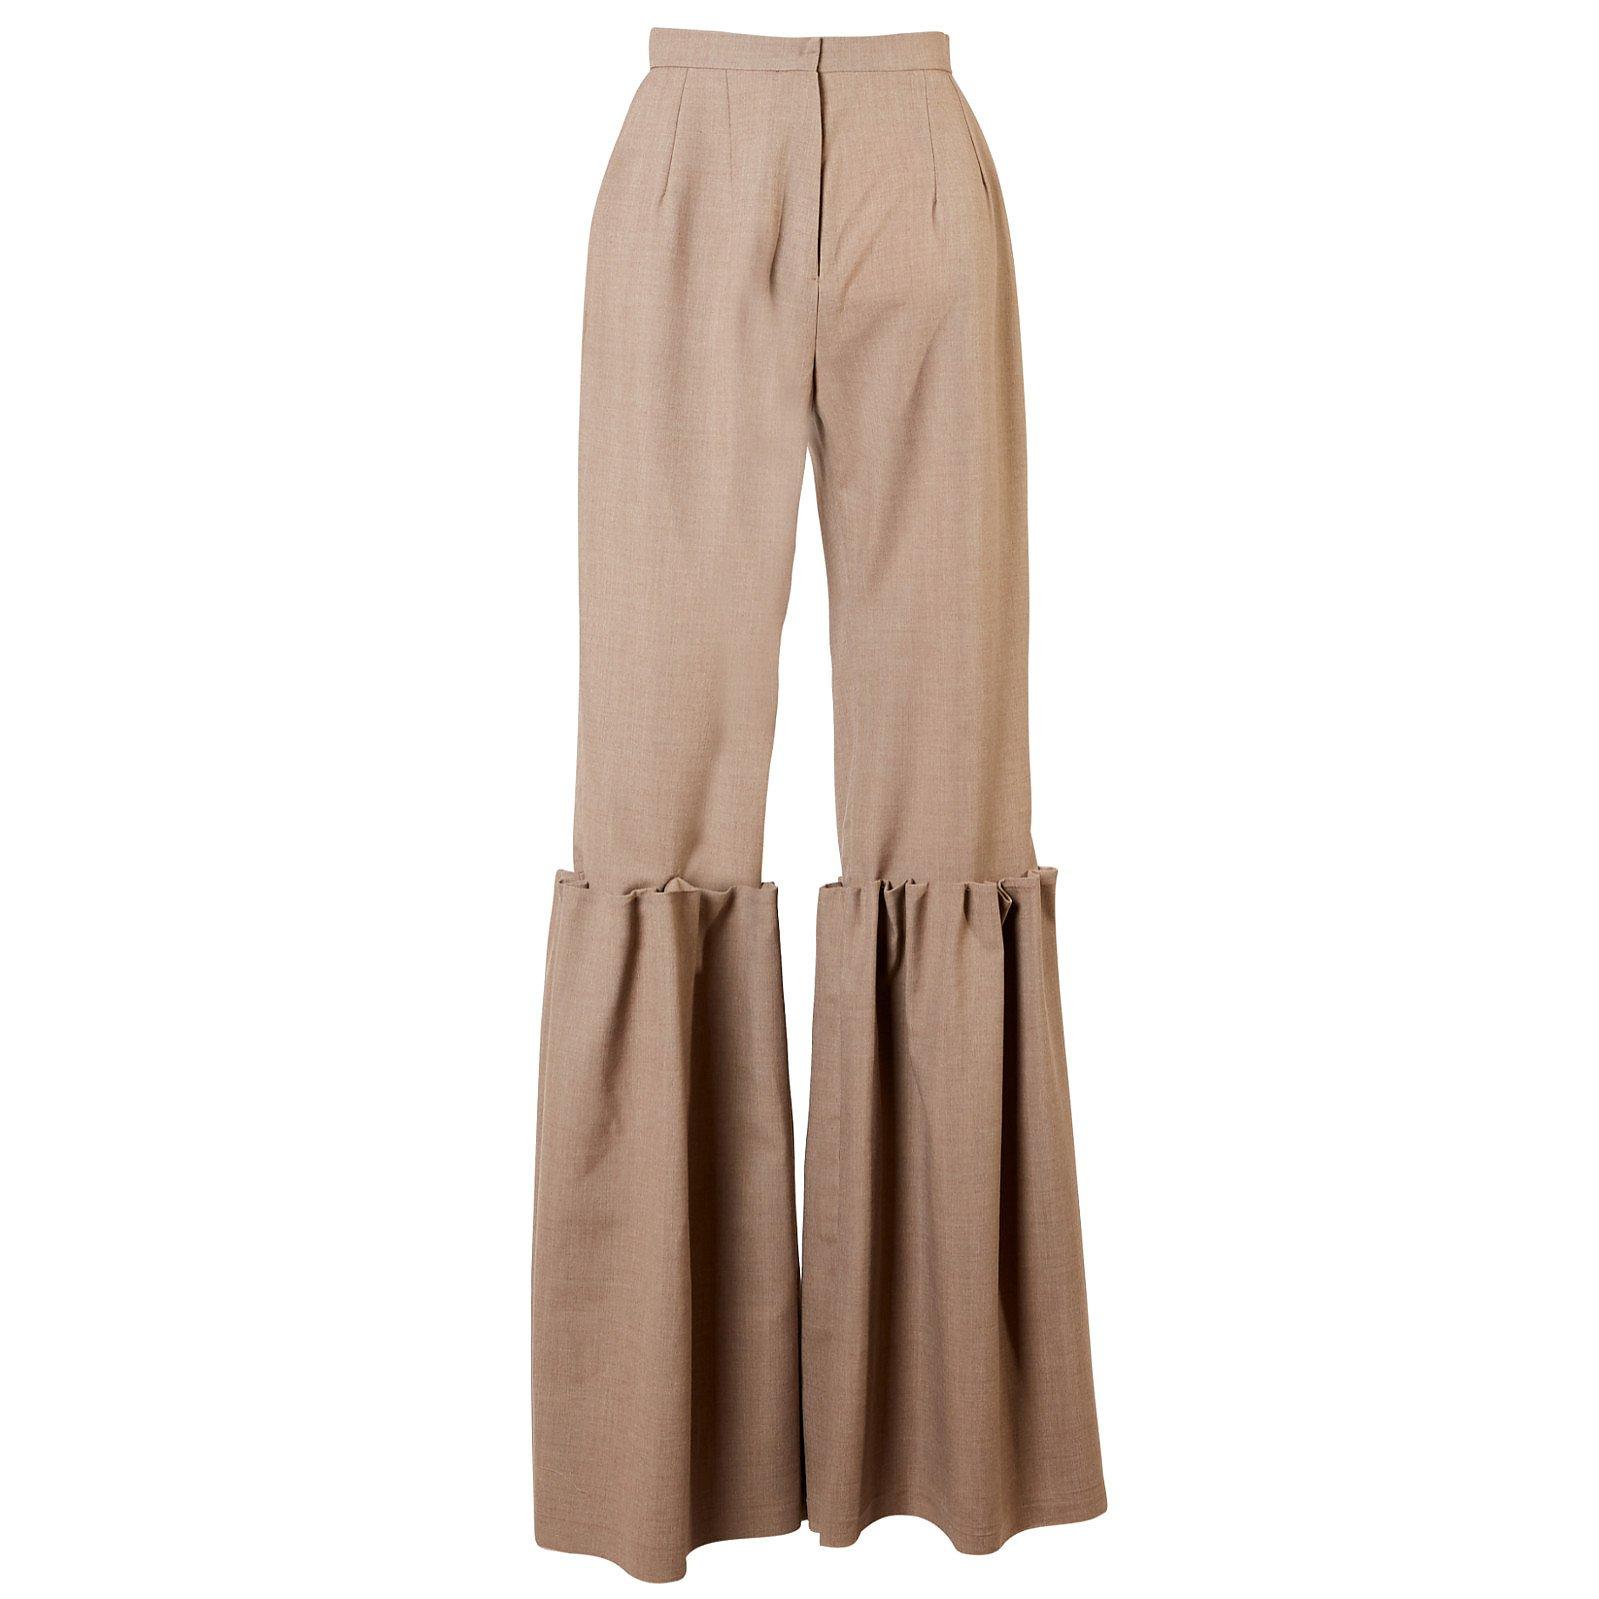 Maison Bent Gathered Trousers